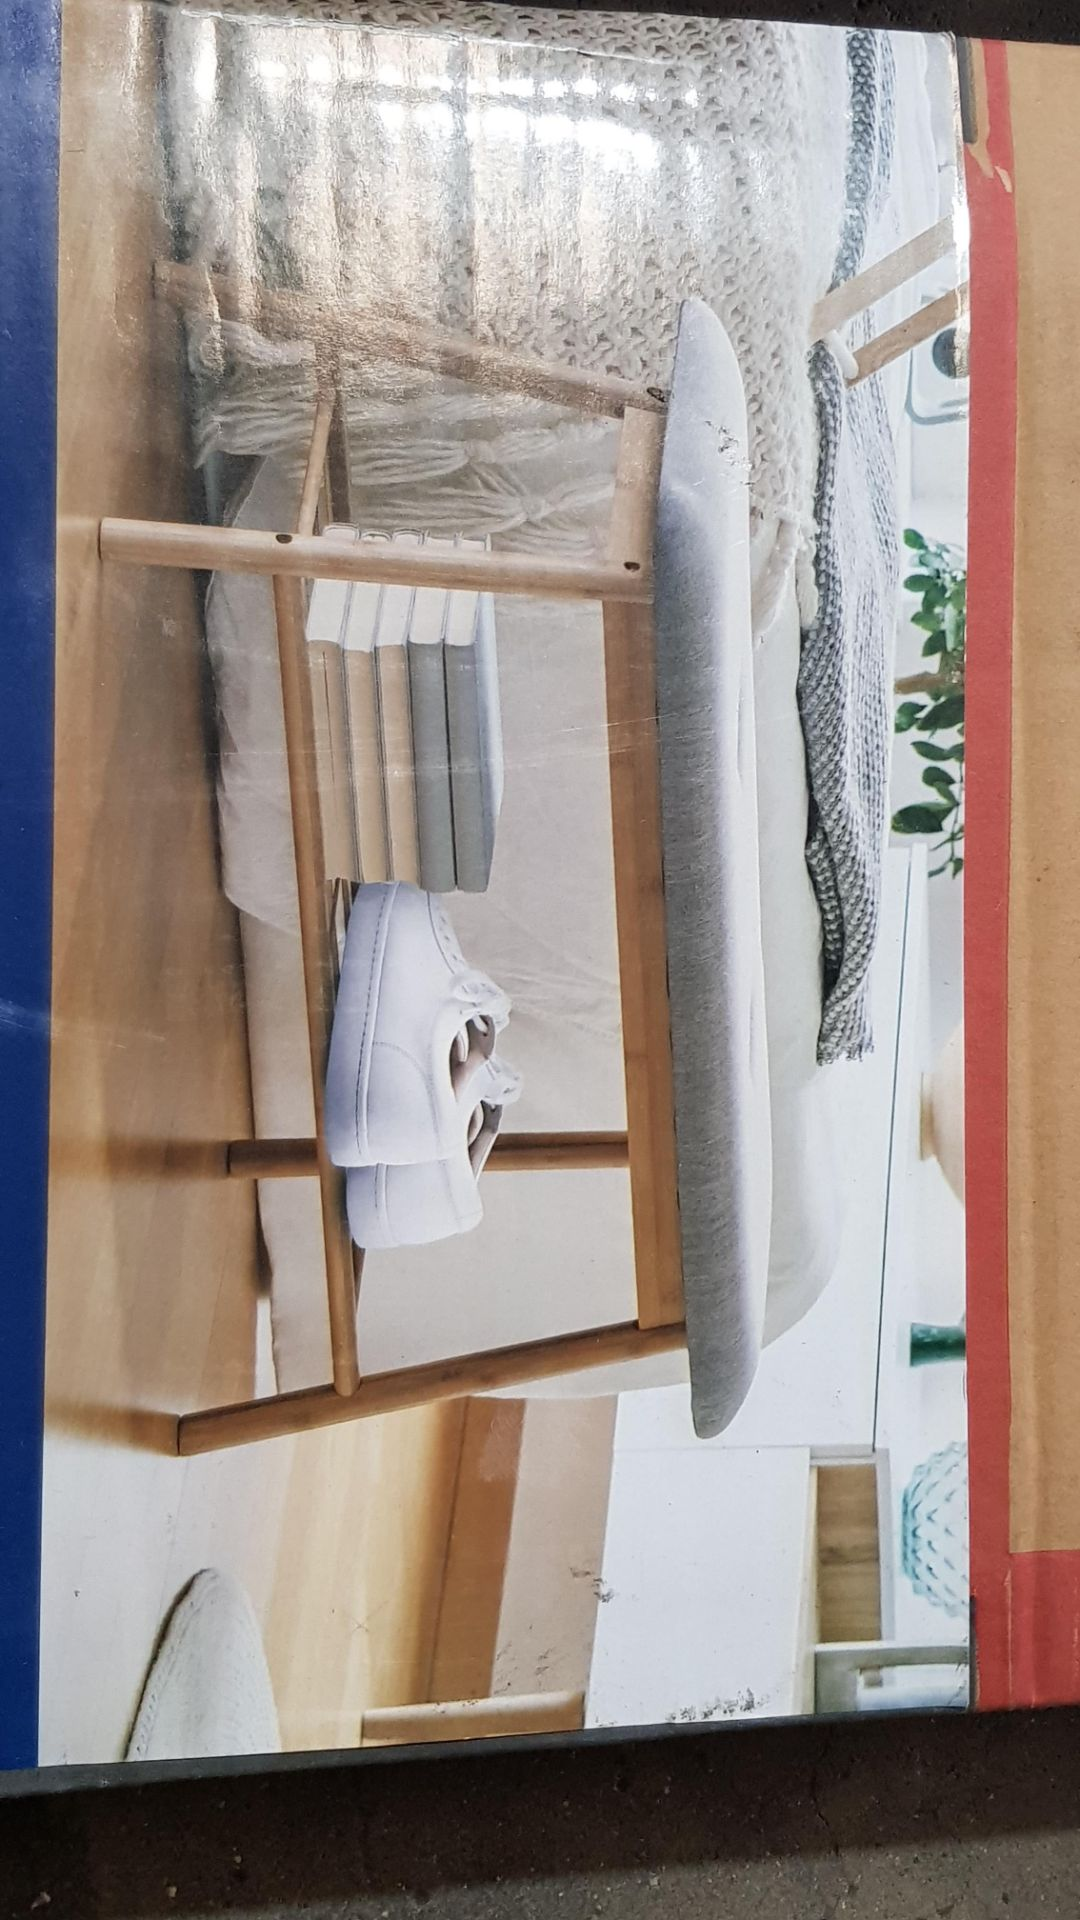 (3E) 2x Items. 1x Living Elements Bamboo Shoe Bench With Grey Cushion Seat. 1x VidaXL.com Radiator - Image 5 of 7